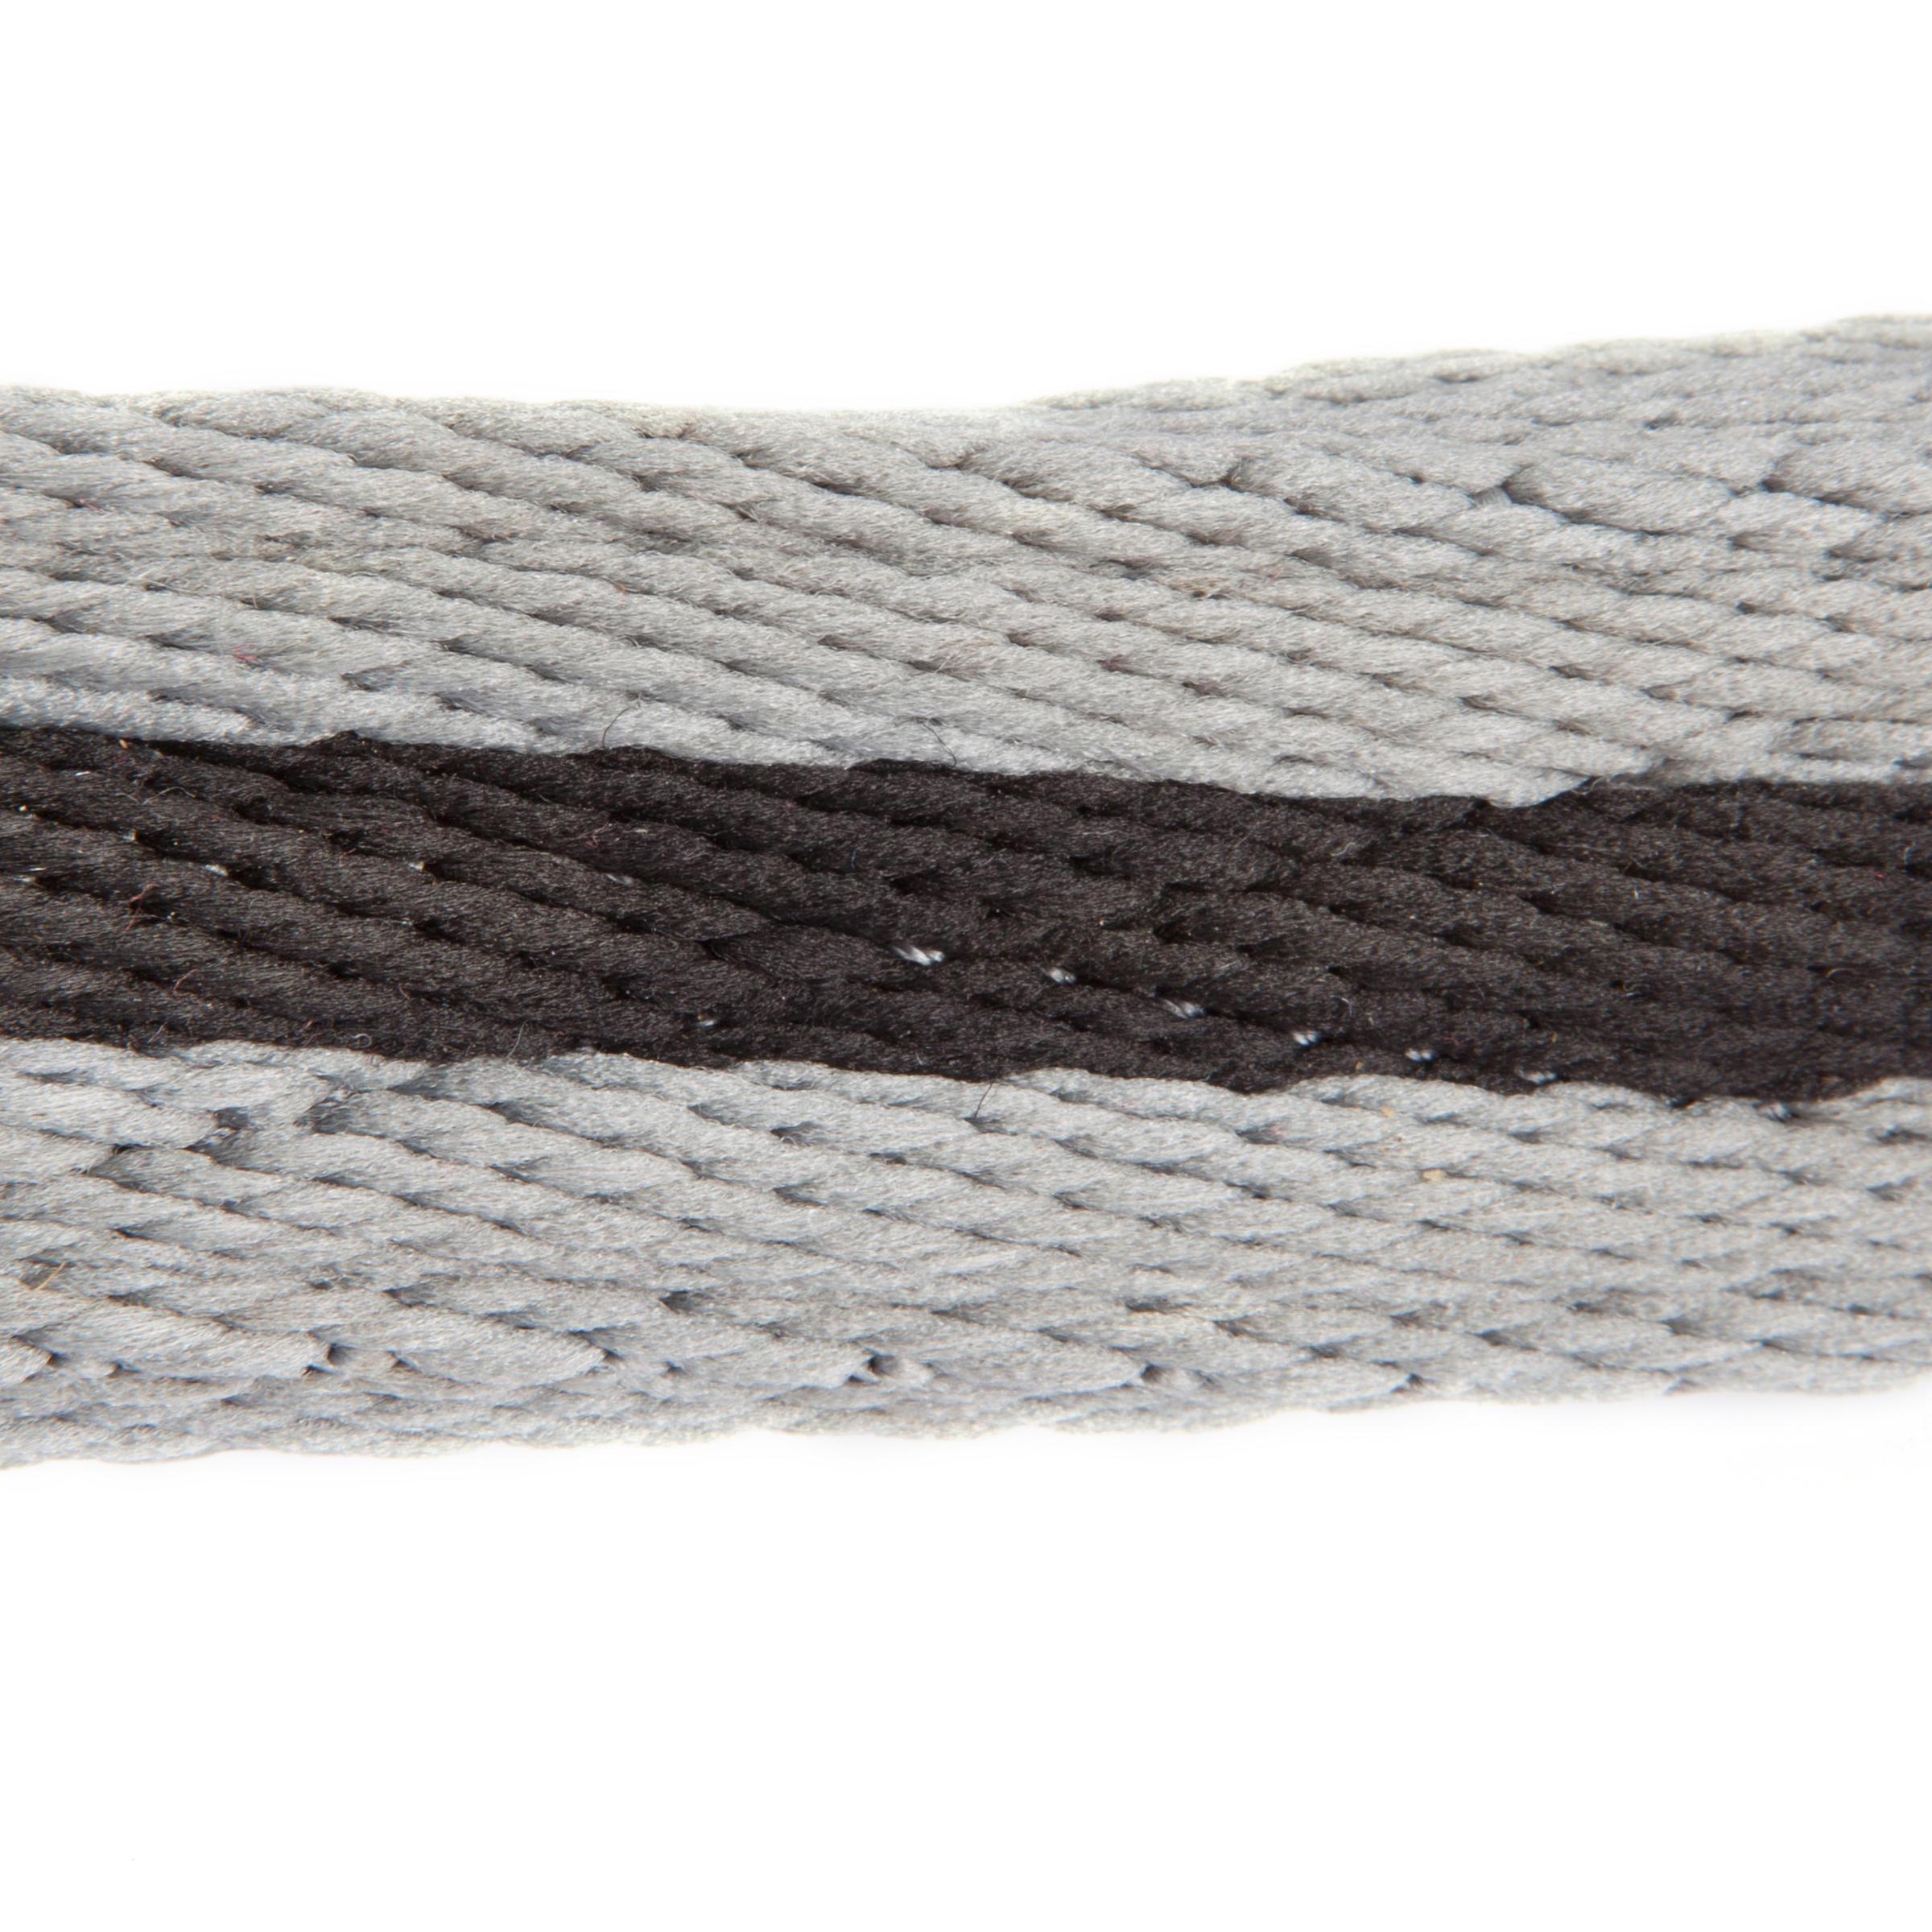 Soft Horse Riding Curb Strap - Black/Grey